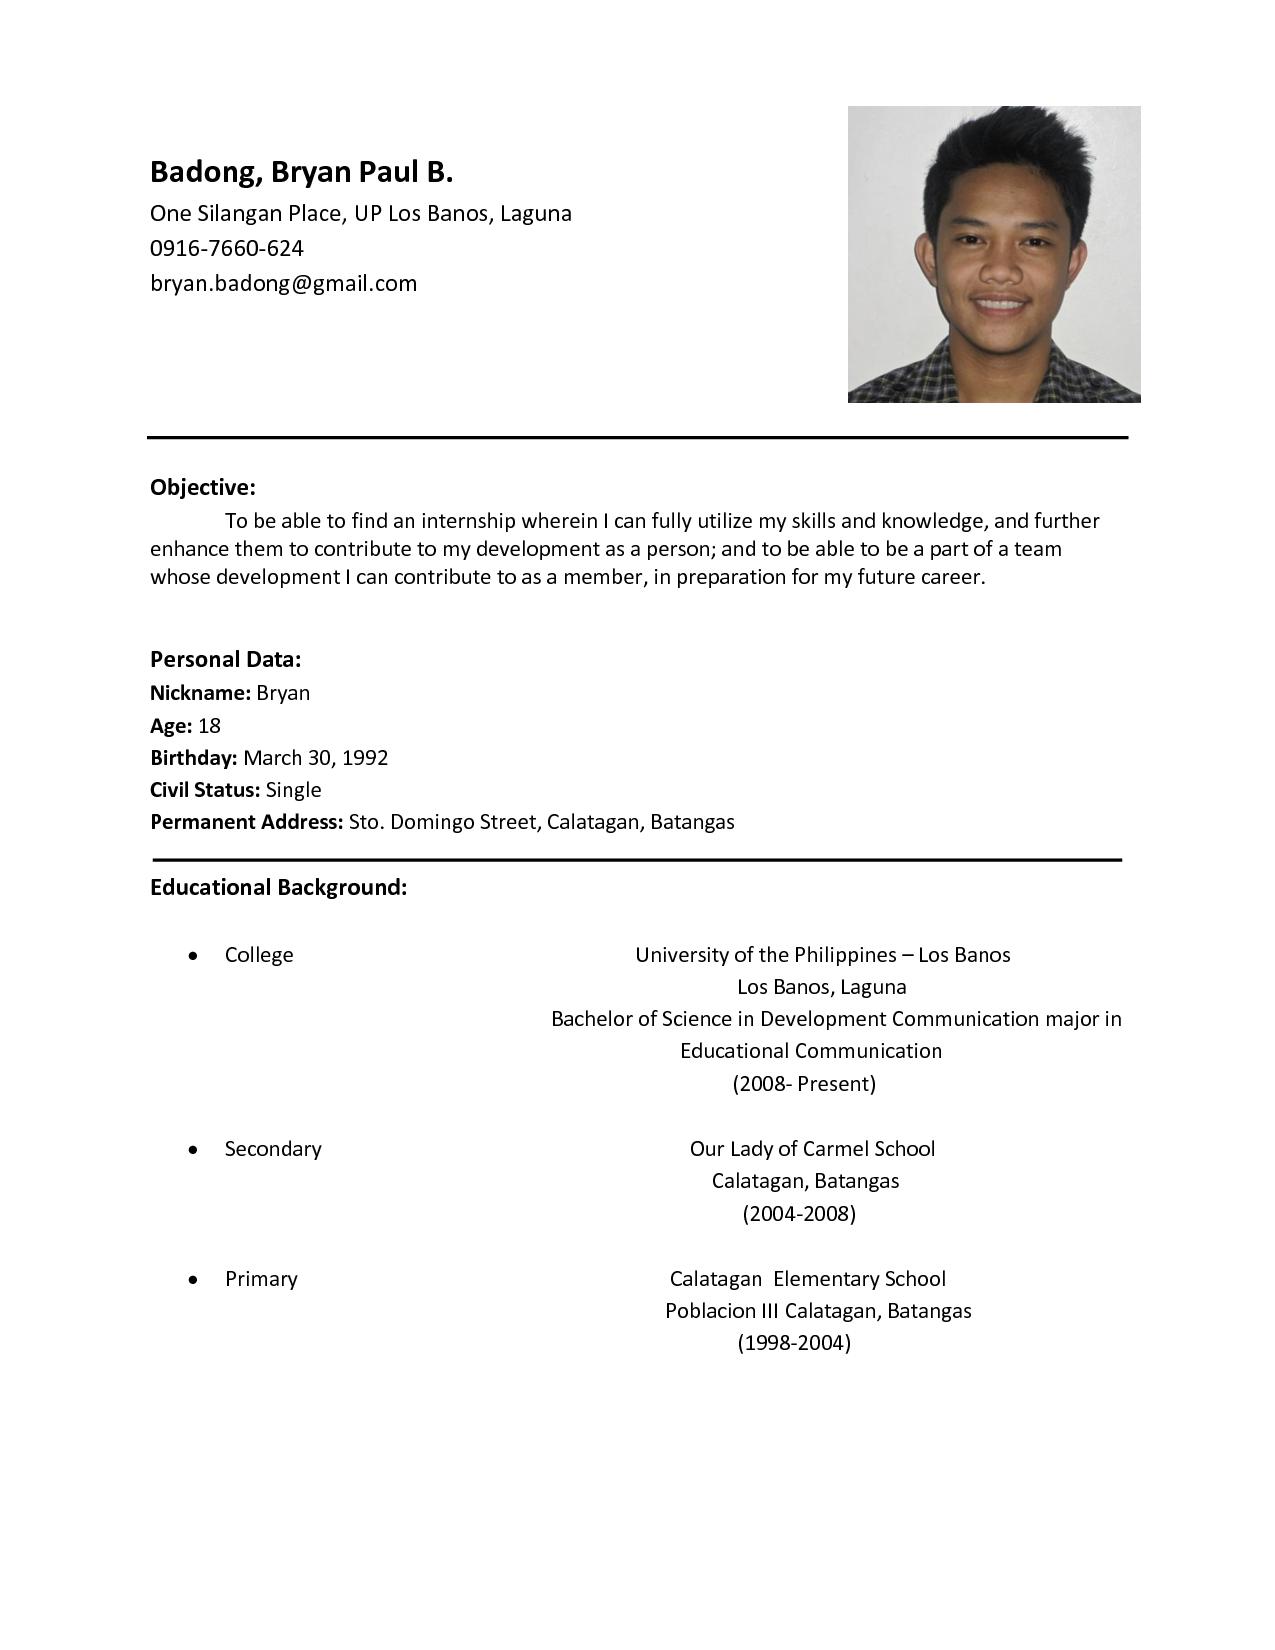 Resume Sample Best Template Hd Sample Resume Free Hd Letter Sample And Cover Letter Samples Sample Resume Format Basic Resume Examples Basic Resume